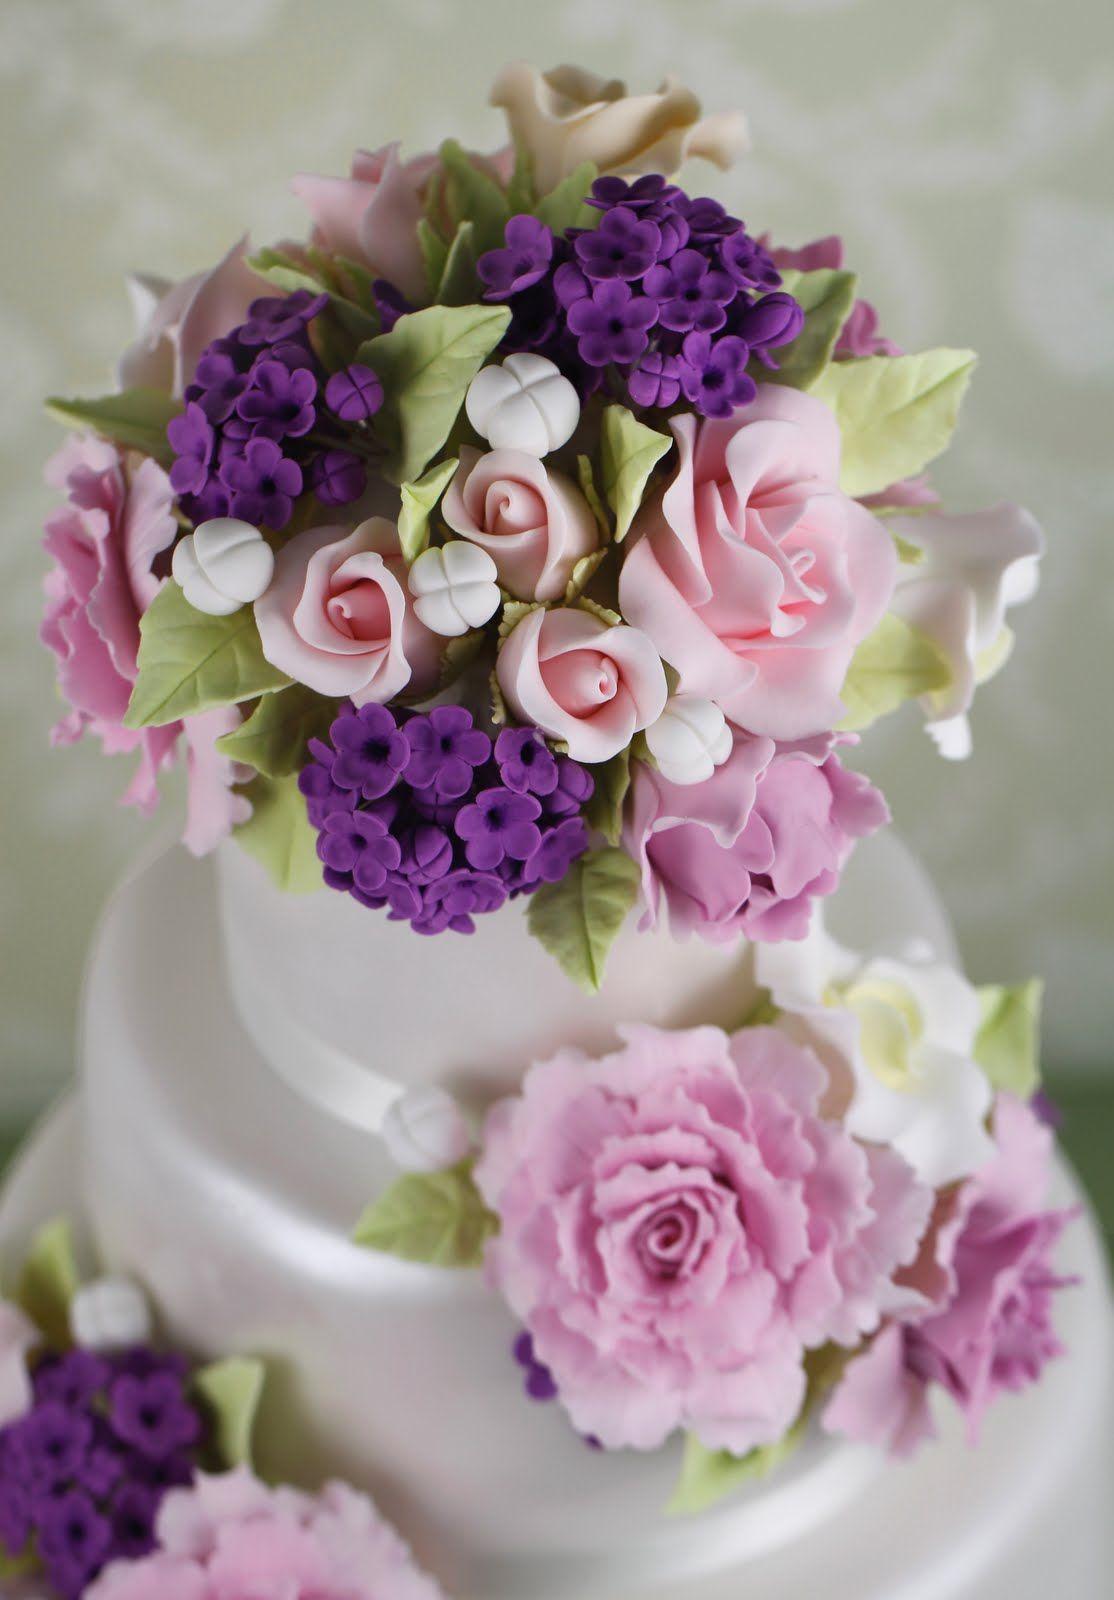 Tarta de boda con conjunto floral | Boda ❤ | Pinterest | Happy ...